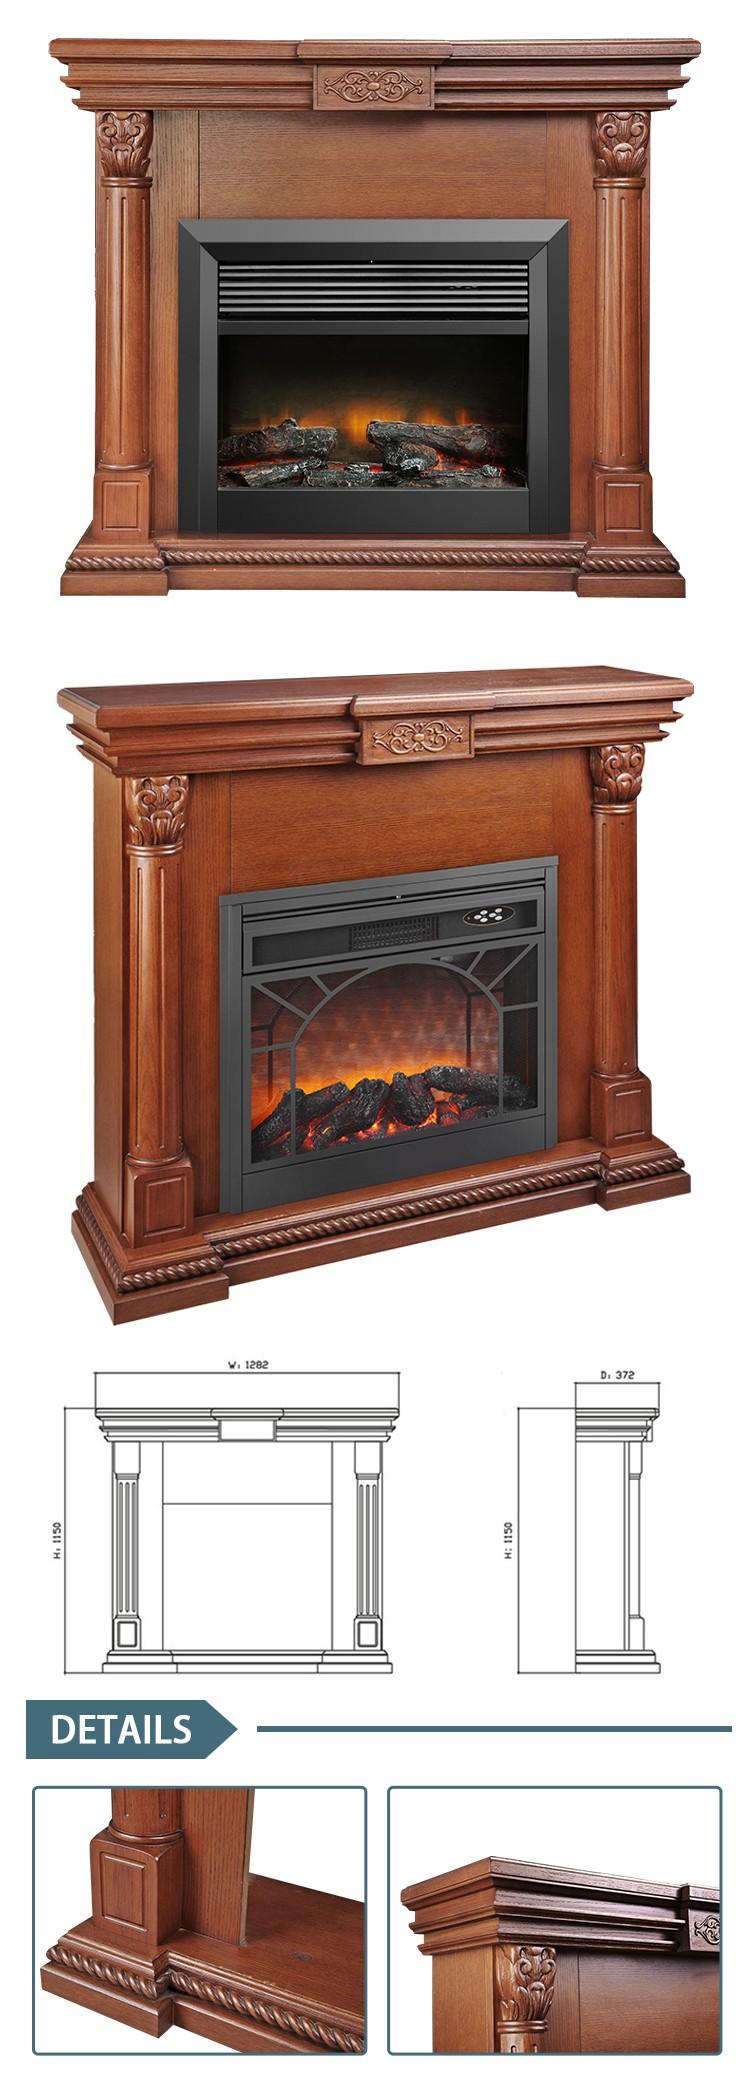 Attentive Service Factory Price Antique White Electric Fireplace Buy Antique White Electric